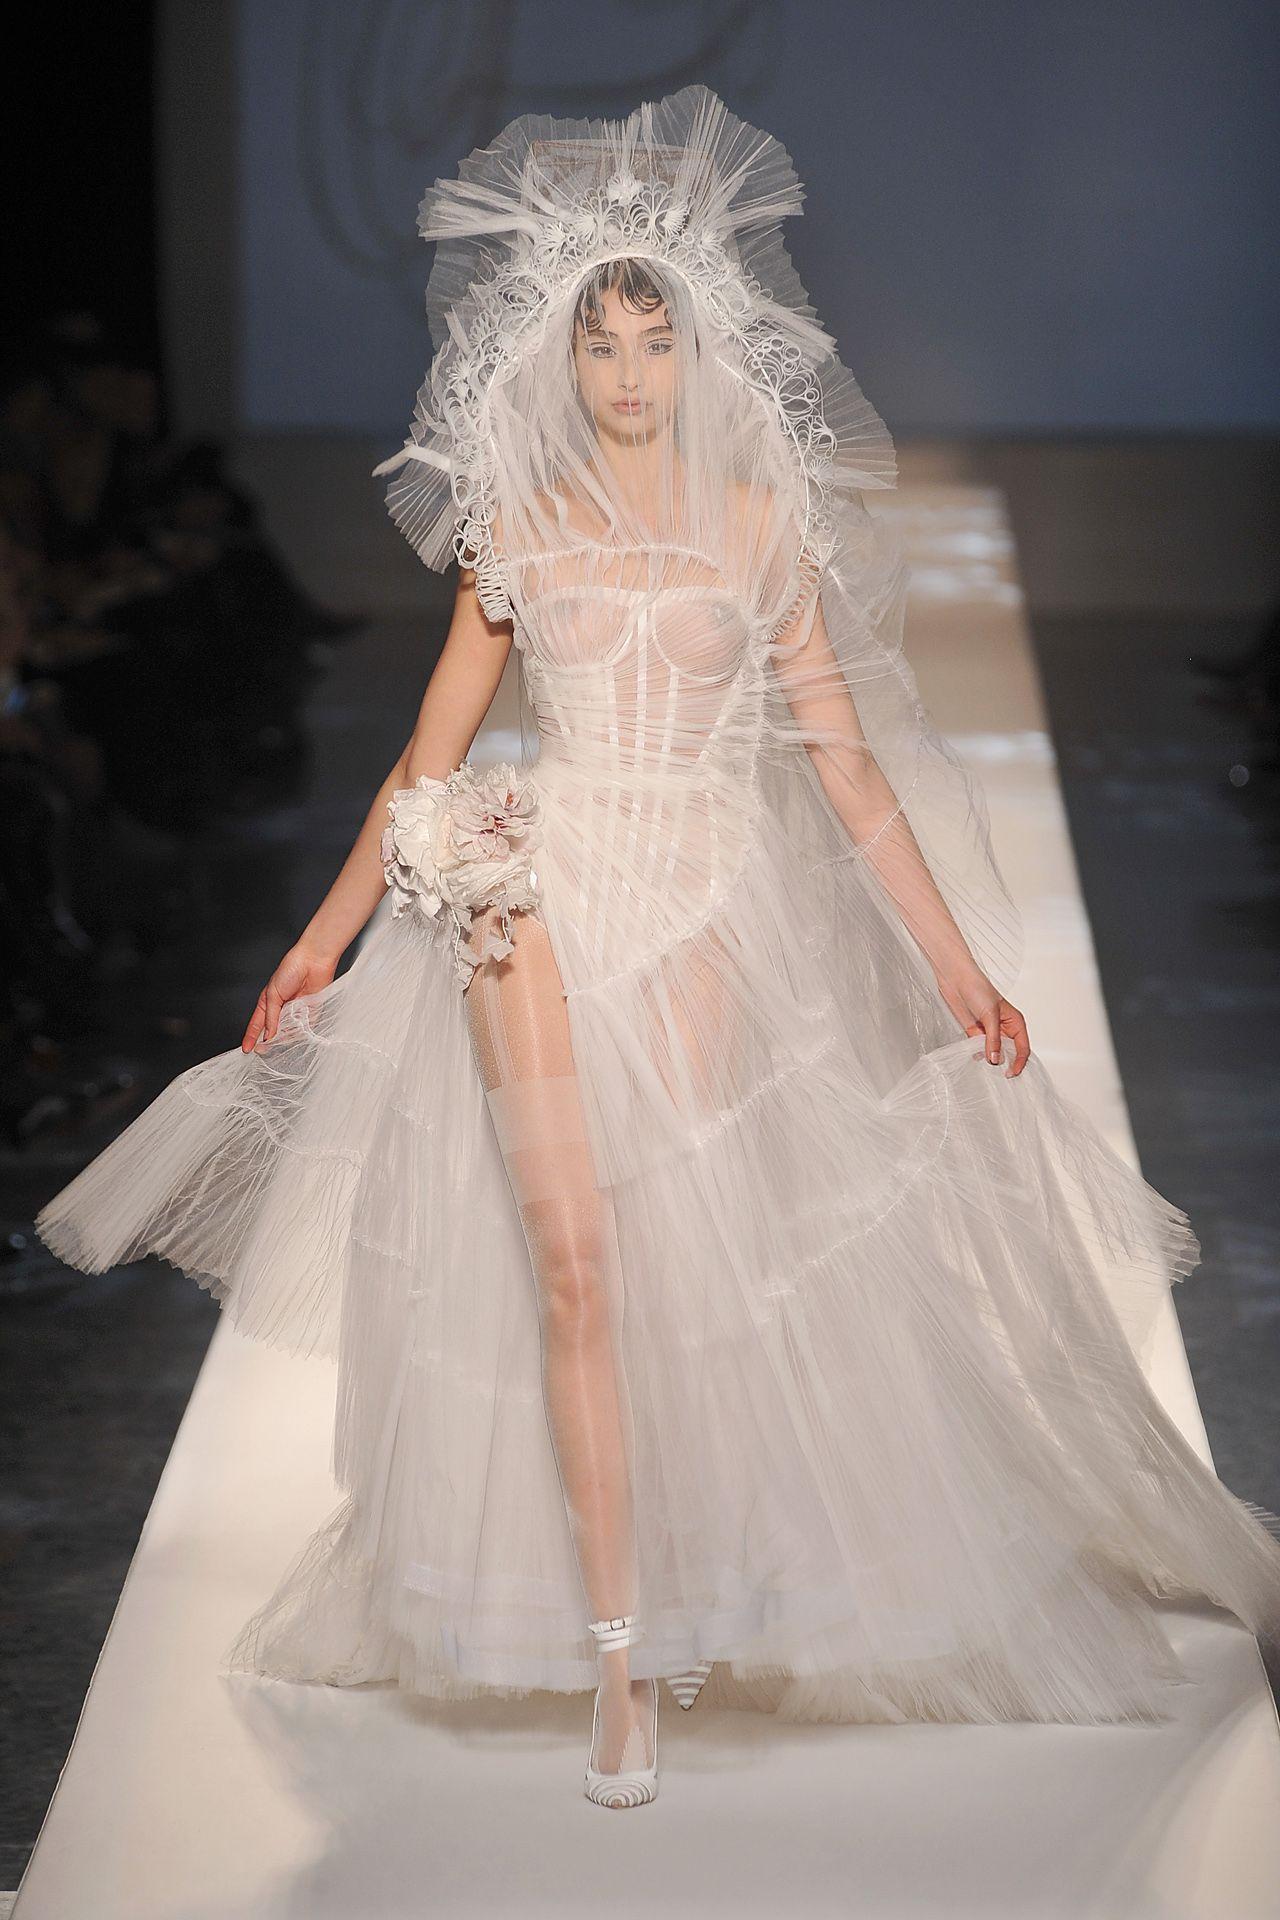 Jean Paul Gaultier Spring/Summer 20 Couture   Jean paul gaultier ...